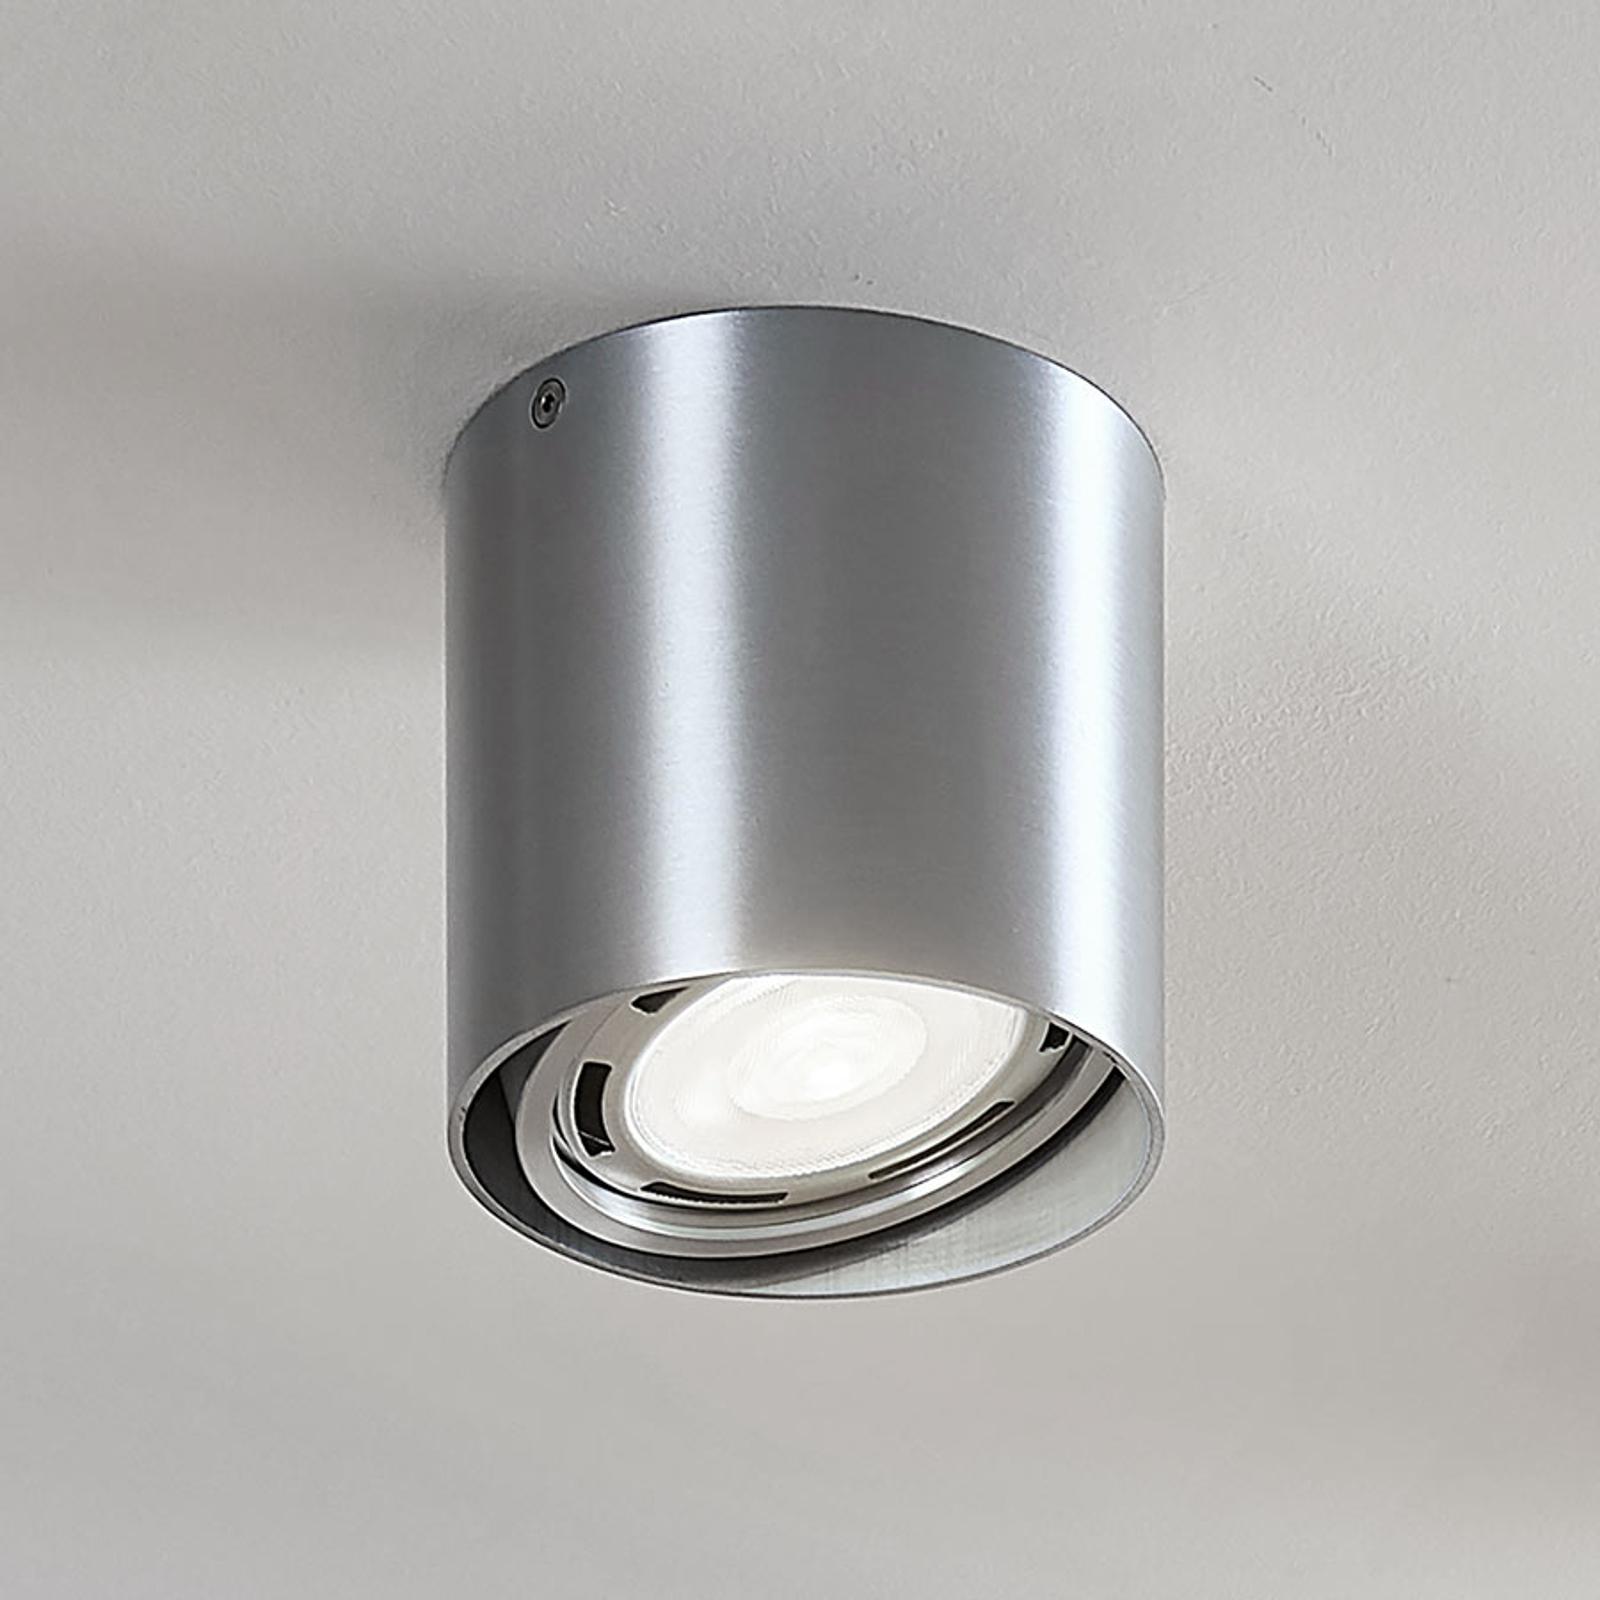 LED downlight Rosalie, dimbaar 1-lamp, rond, alu